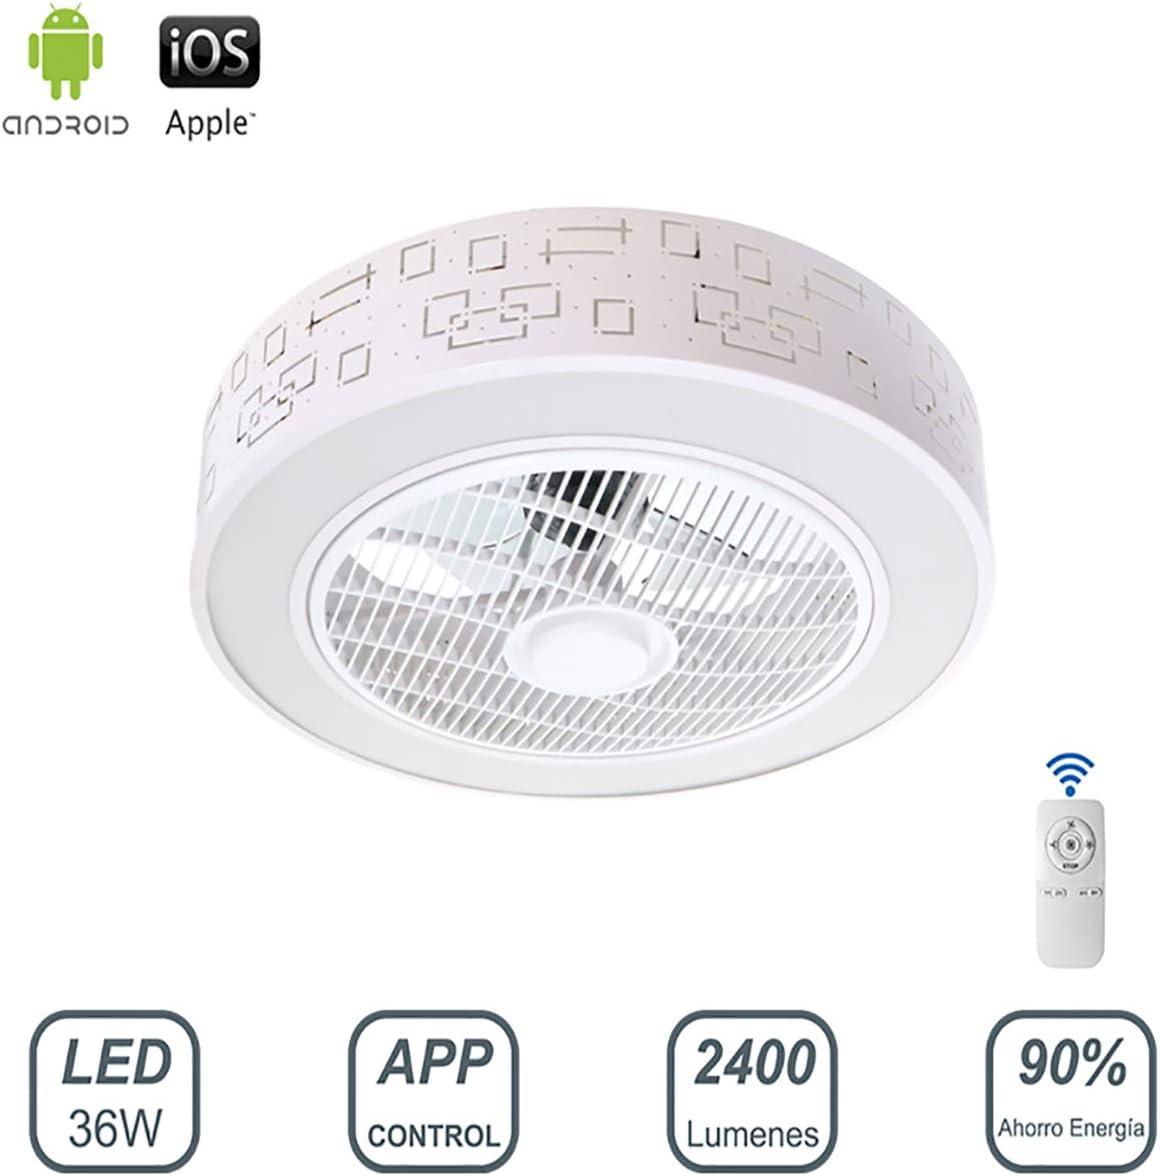 Ventilador de Techo con Lámpara LED 36W Ventilador Invisible App Control con Mando a Distancia Luz Regulable Luz Fría/Neutra/Cálida Φ51*H20cm